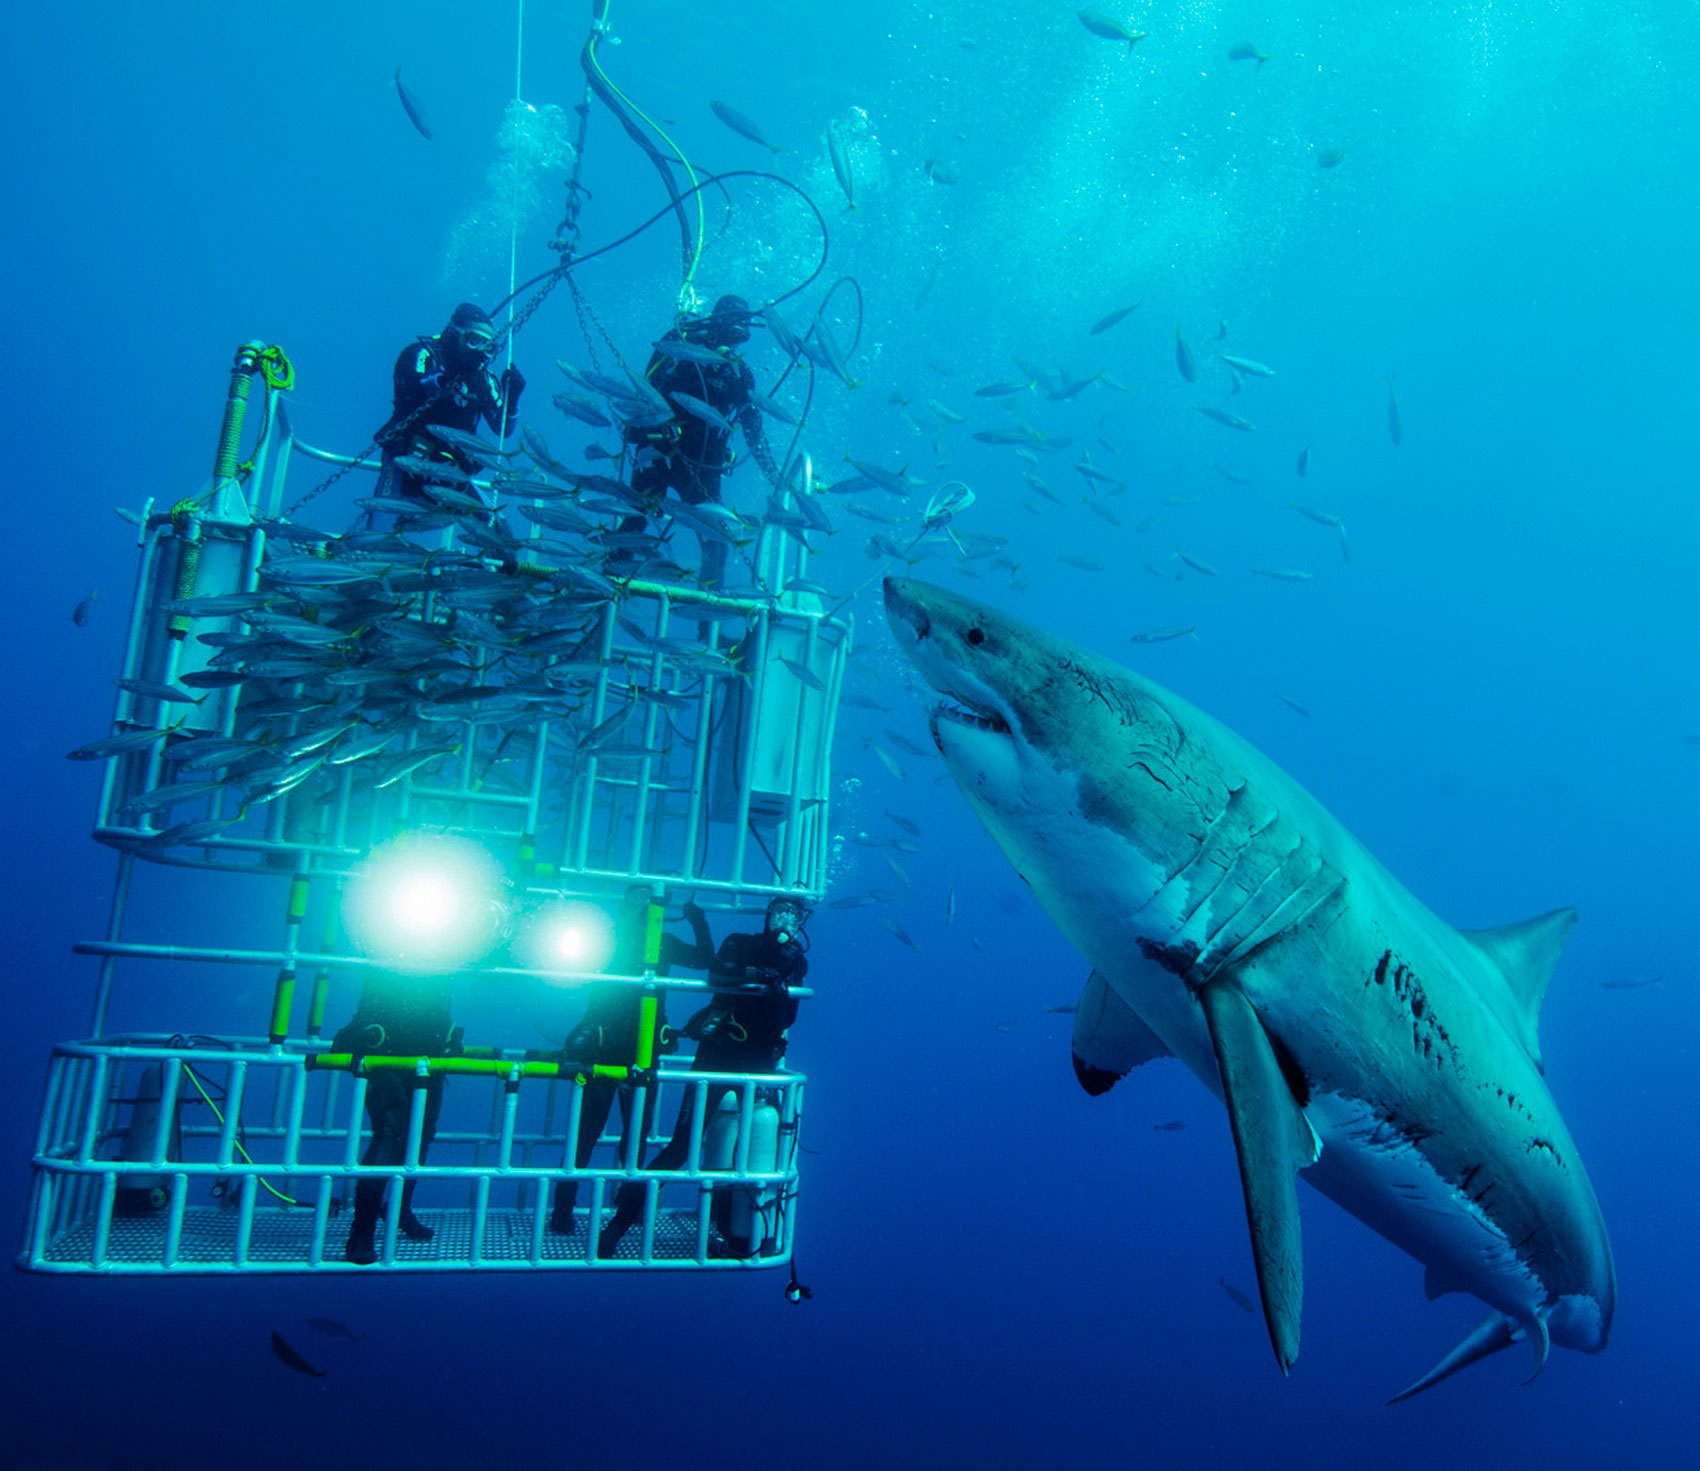 дайверы и акула, фото